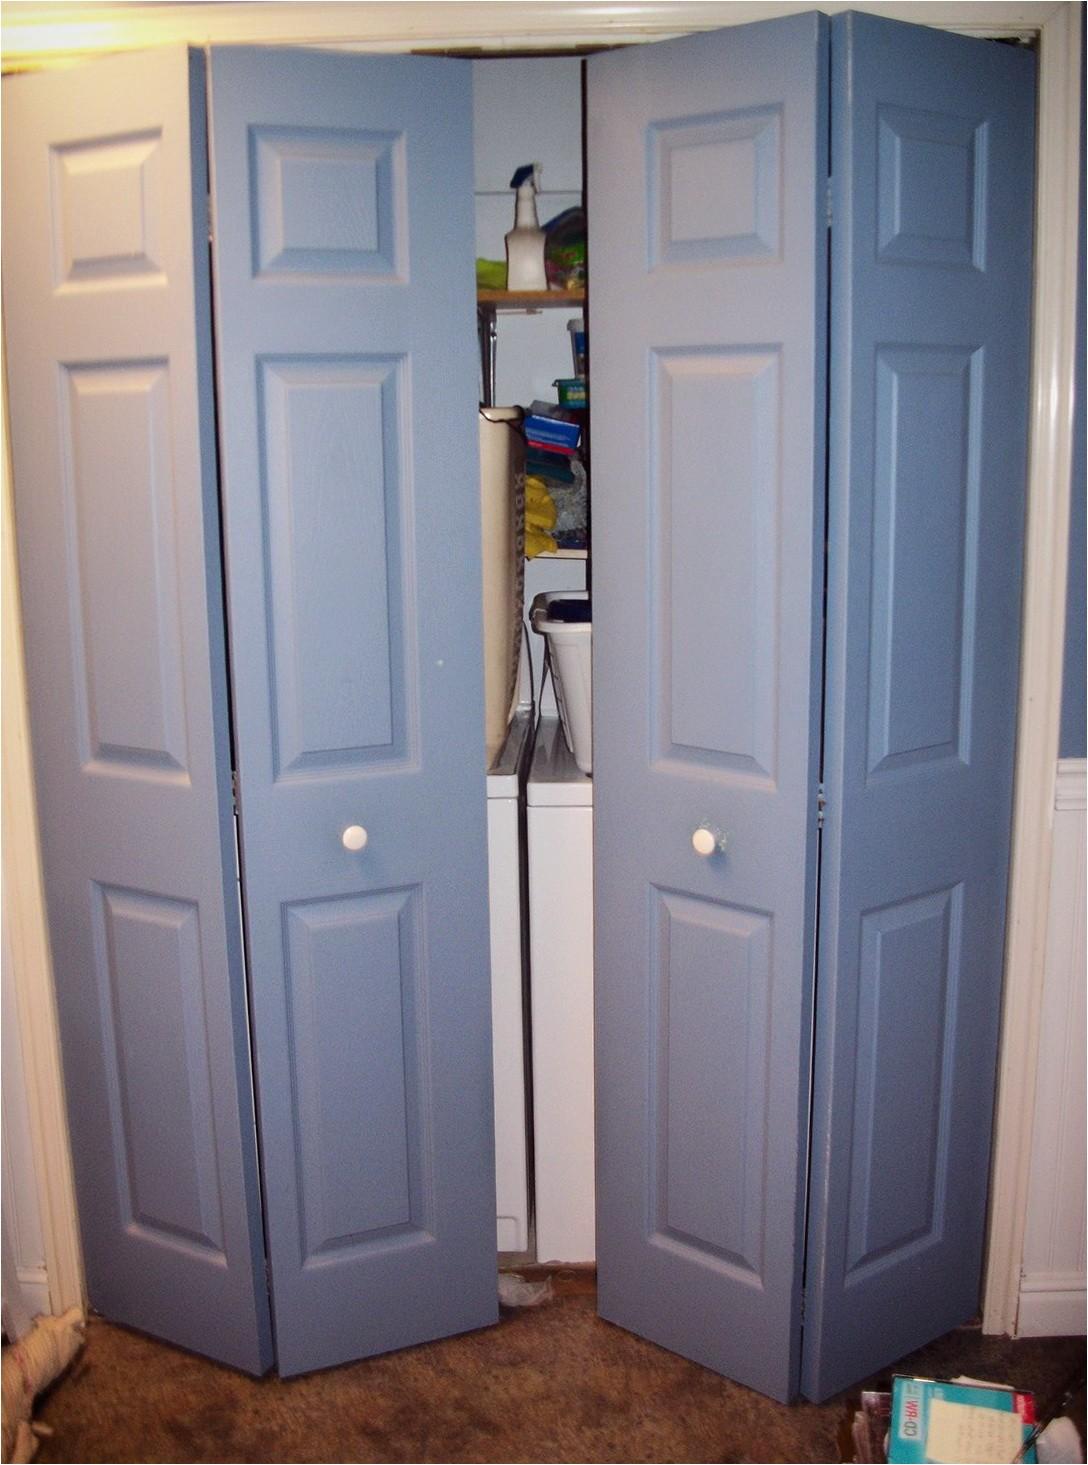 Bifold Closet Door Hardware Placement Bifold Closet Door Hardware Placement Home Design Ideas